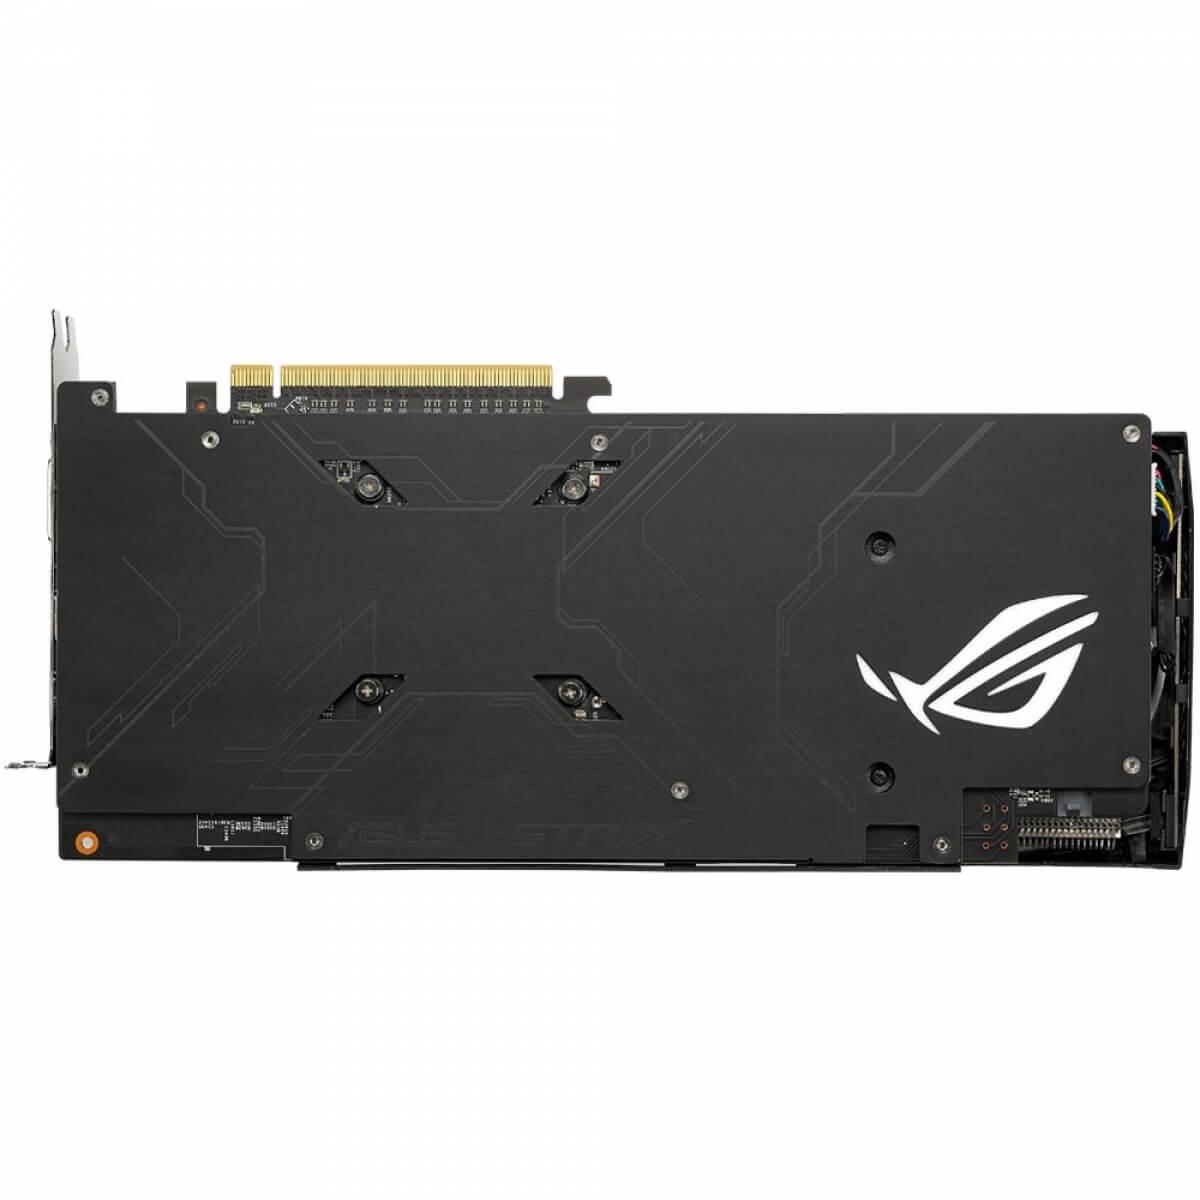 Placa de Vídeo ASUS Radeon RX 580 STRIX ROG Edition ROG-STRIX-RX580-T8G 8GB GDDR5